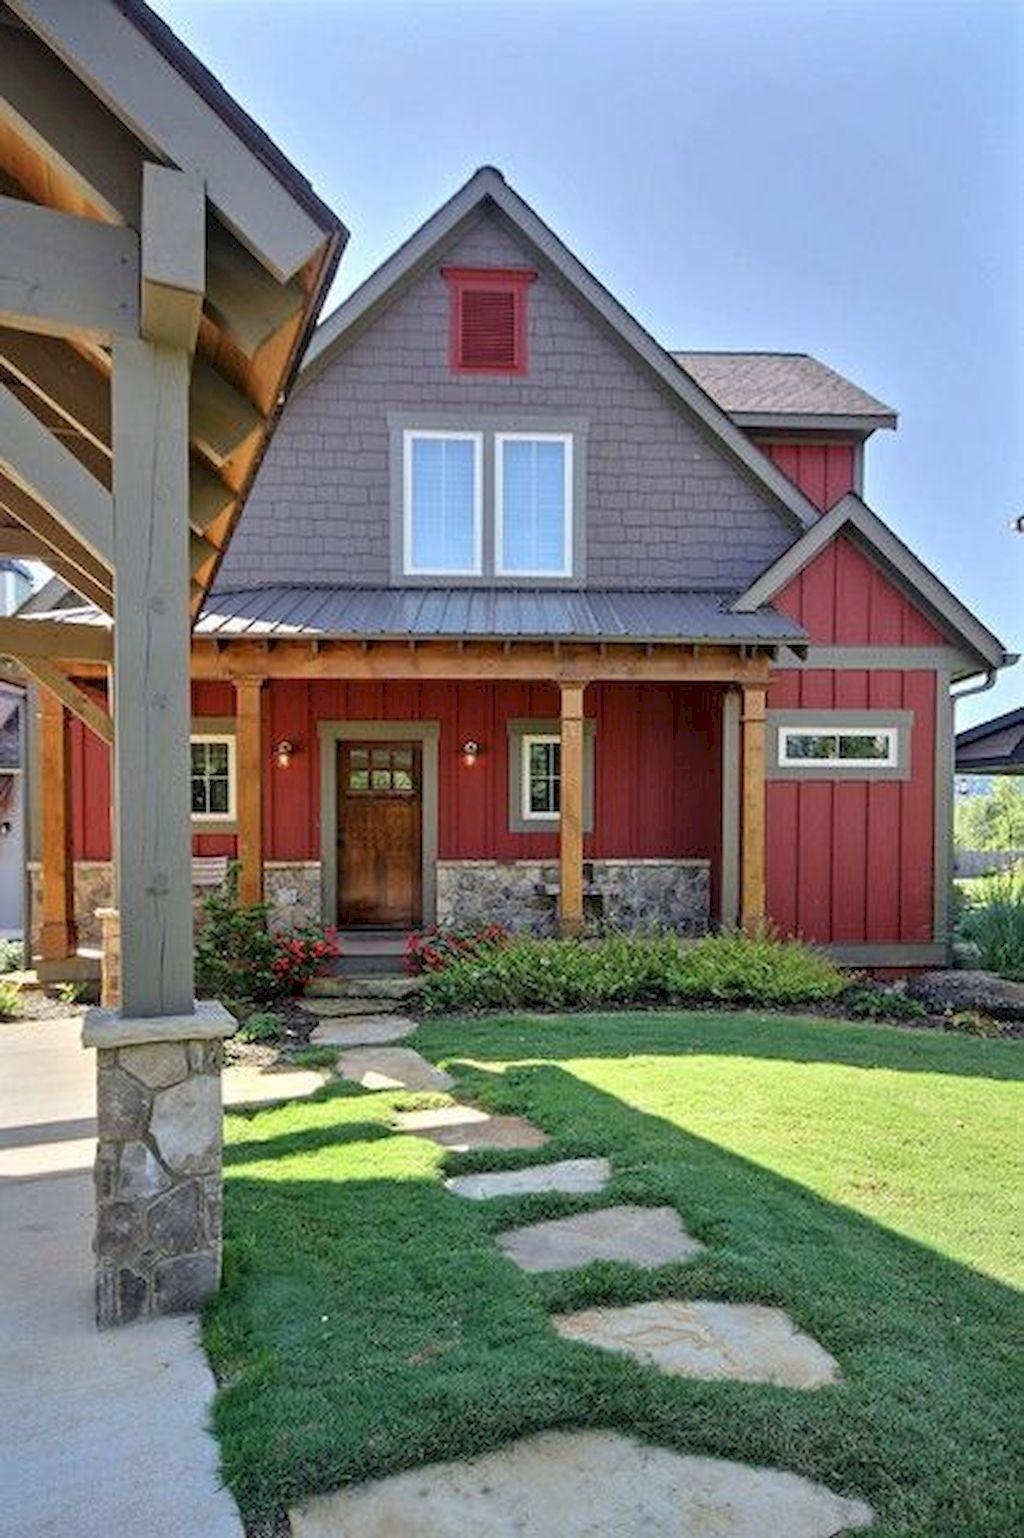 Nice 99 Awesome Farmhouse Home Exterior Design Ideas More At 99homy